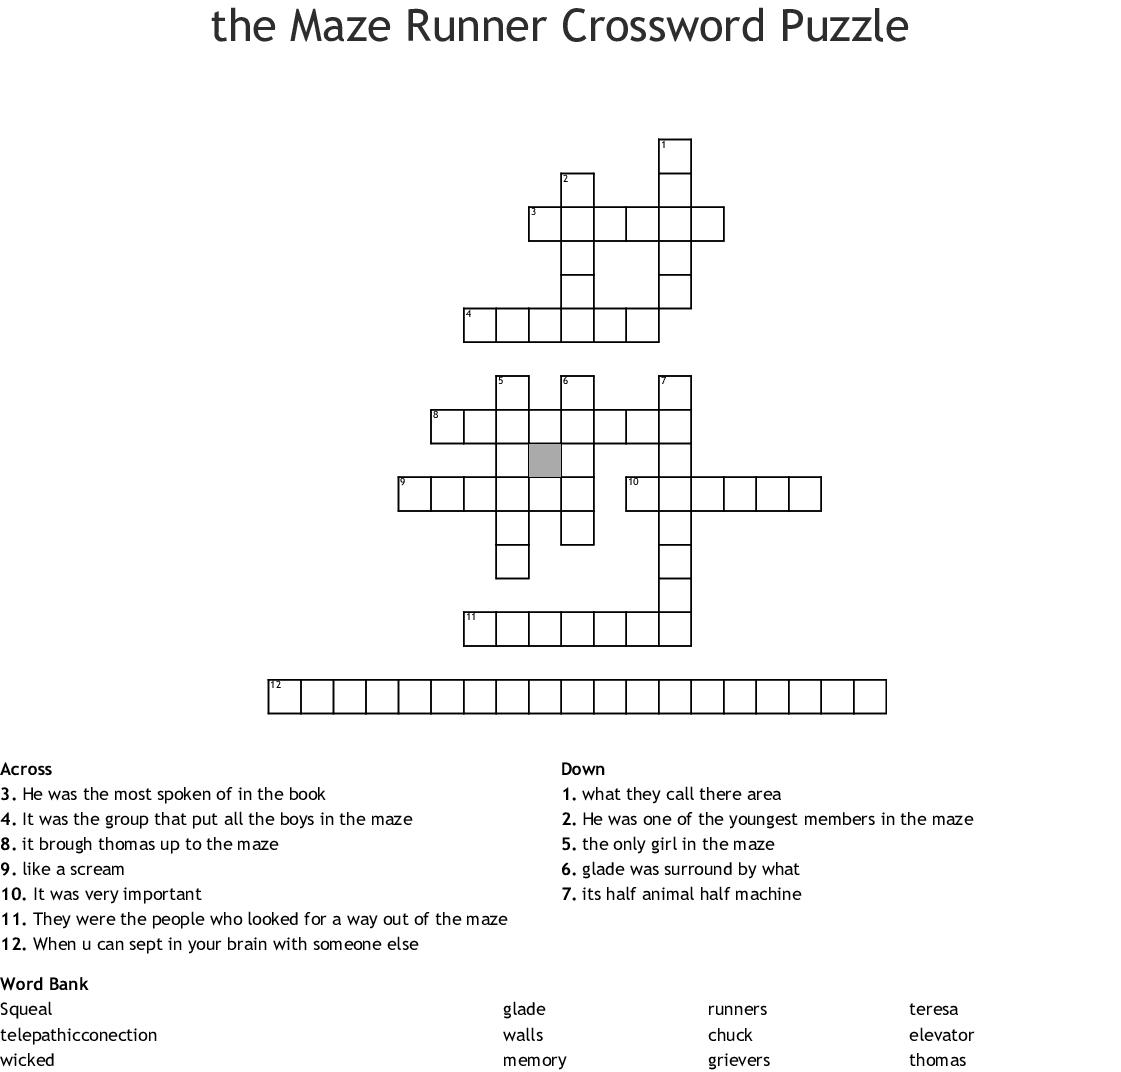 The Maze Runner Crossword Puzzle